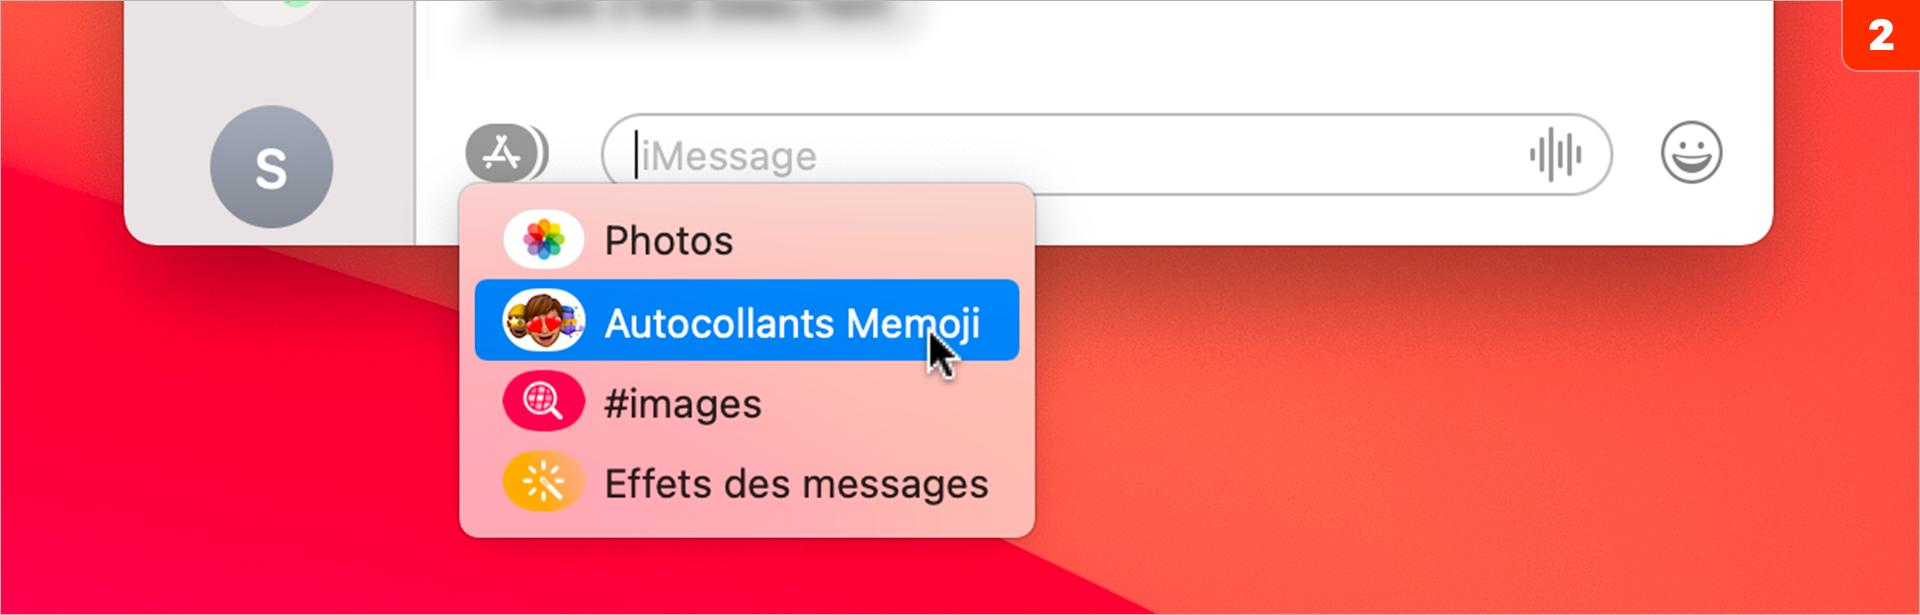 macOS •Créer un memoji depuis l'application Messages